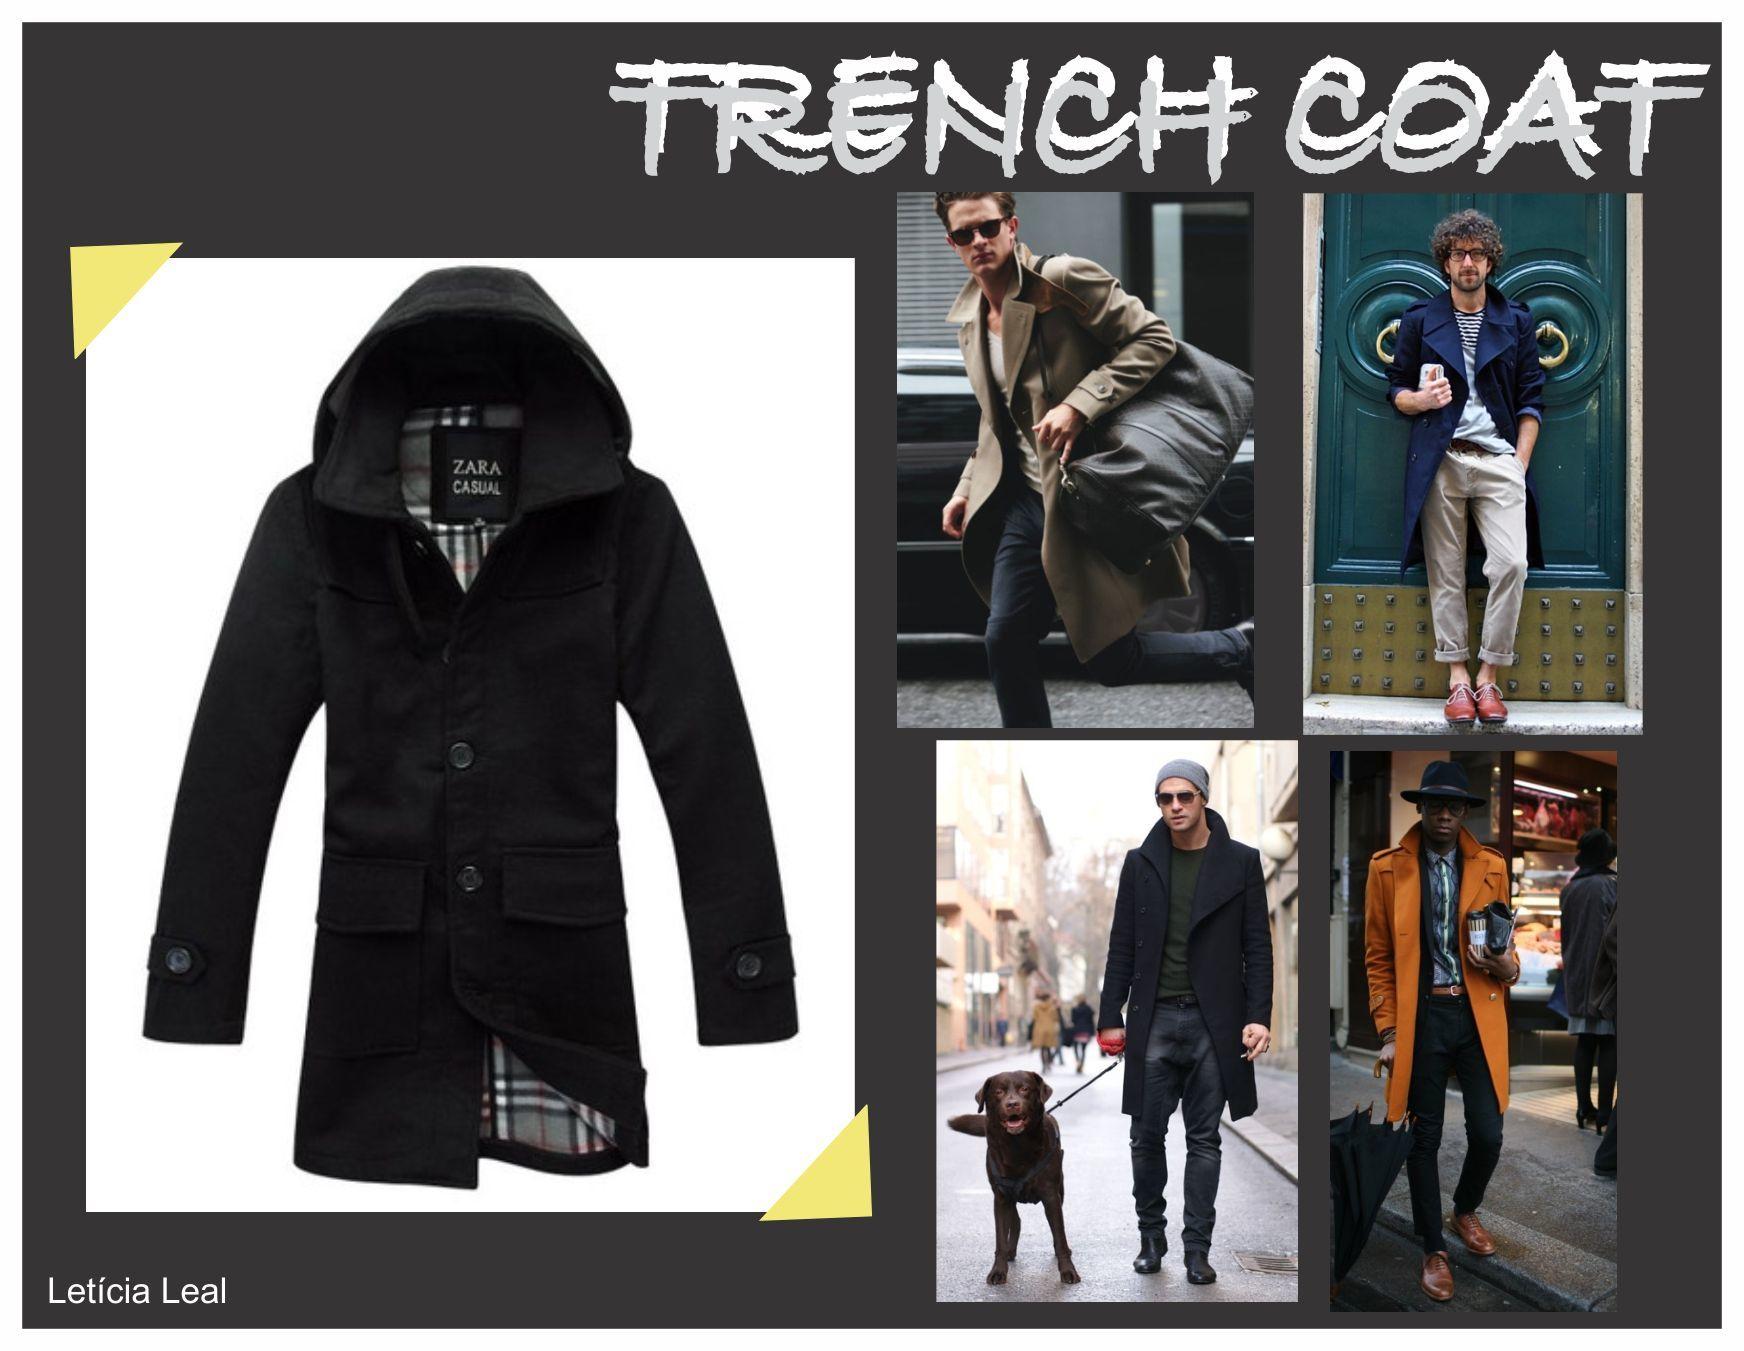 tendencia_inverno_masculino_trench_coat_sos_solteiro